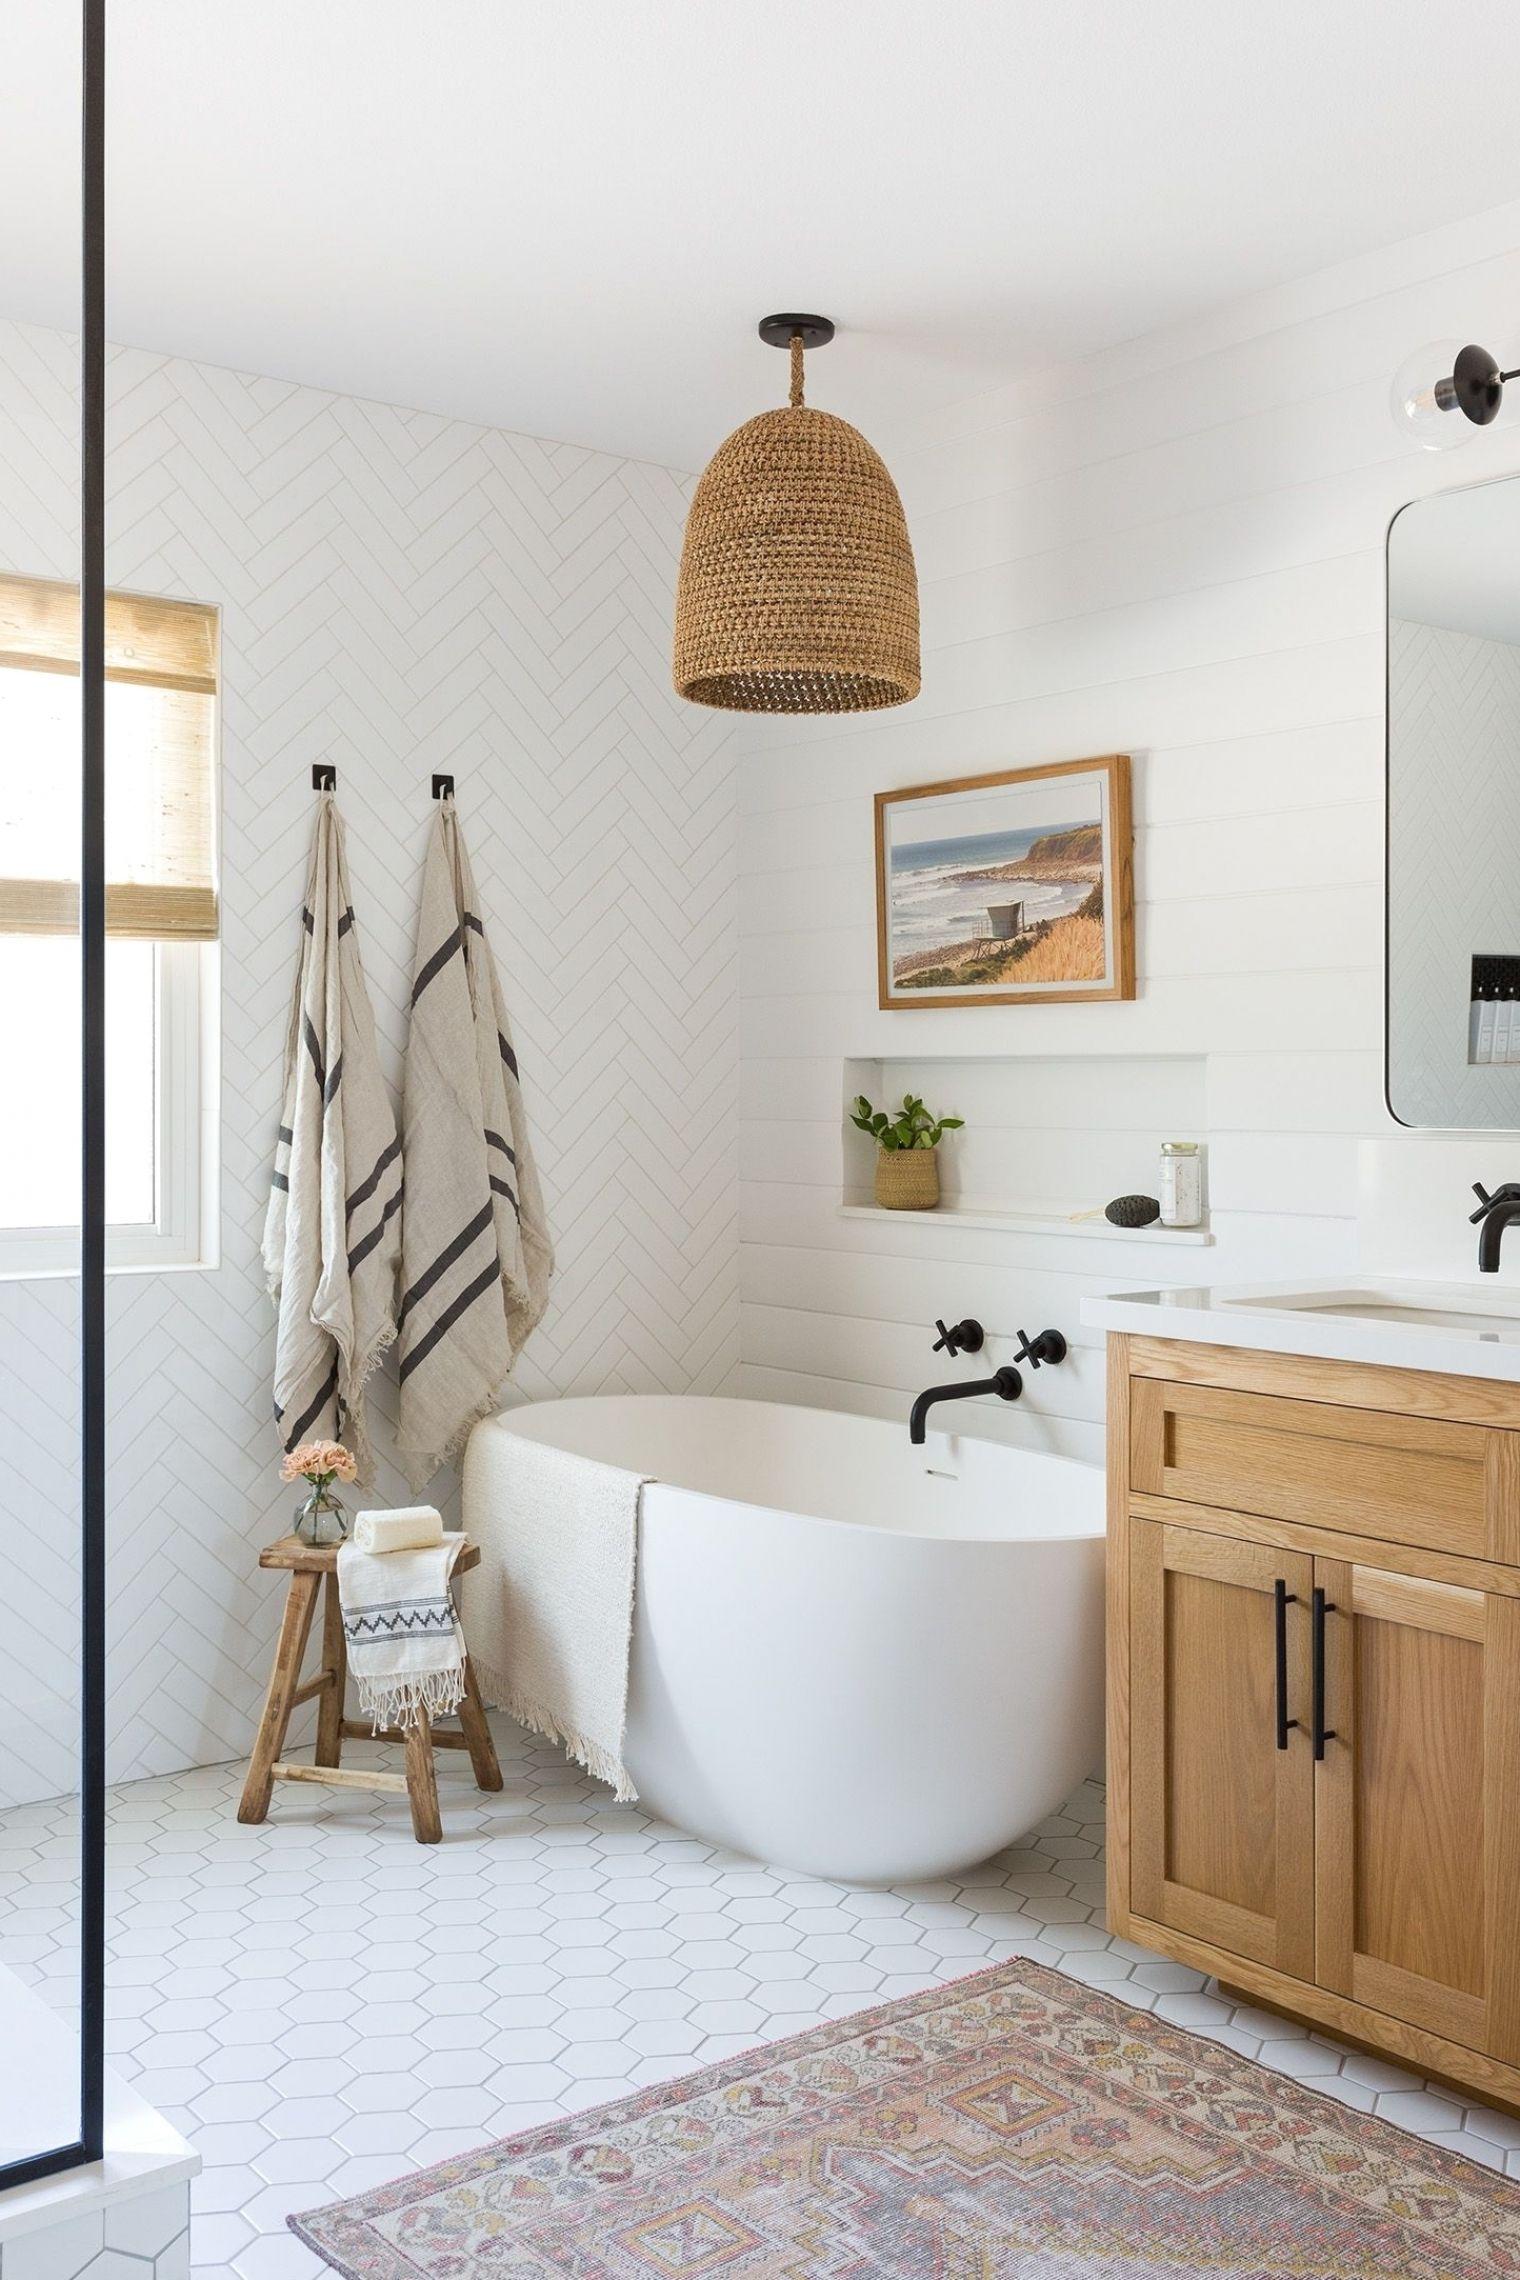 A Large Master Bathroom Designed With Personality Rue Minimalist Bathroom Bathroom Wall Decor Diy Bathroom Decor Master bathroom wall decor